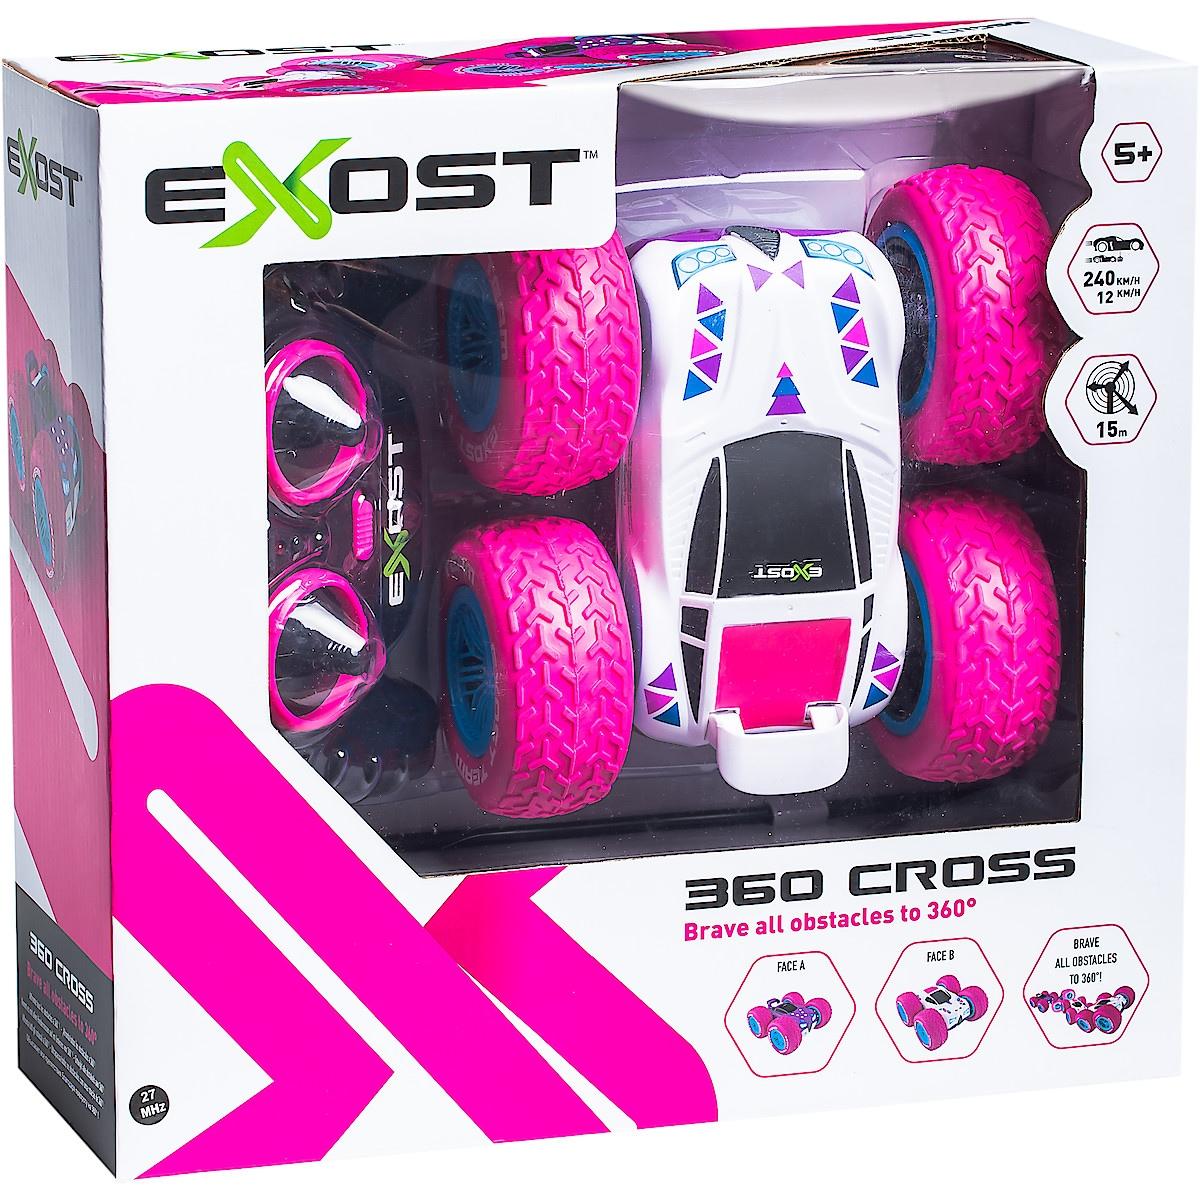 Silverlit Exost 360 Cross, radiostyrt stuntbil